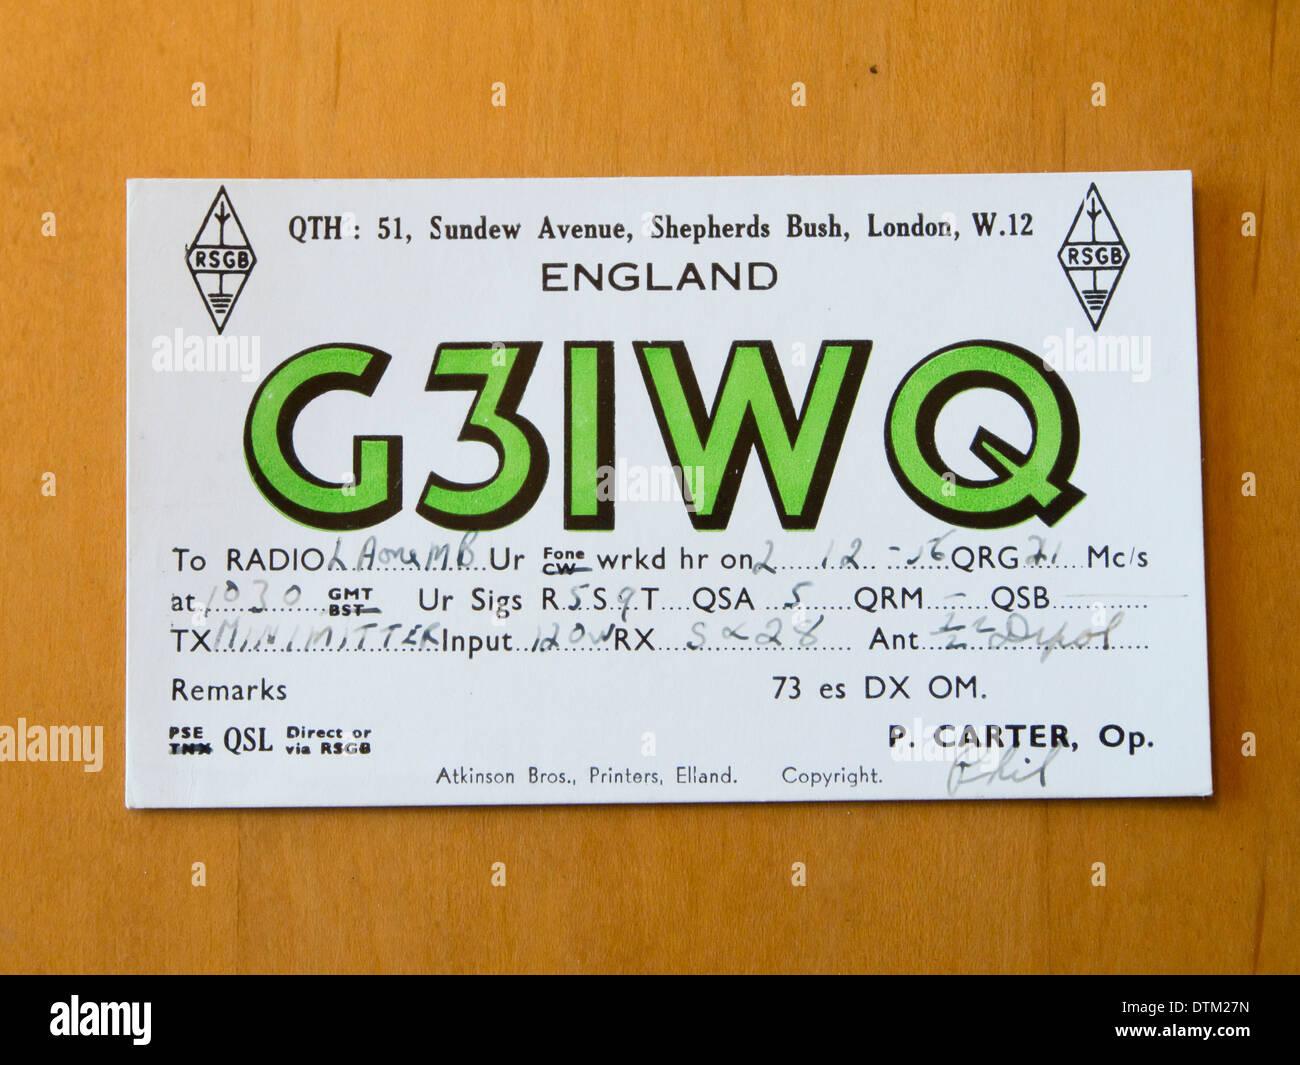 qsl card printing uk - Fashion.stellaconstance.co